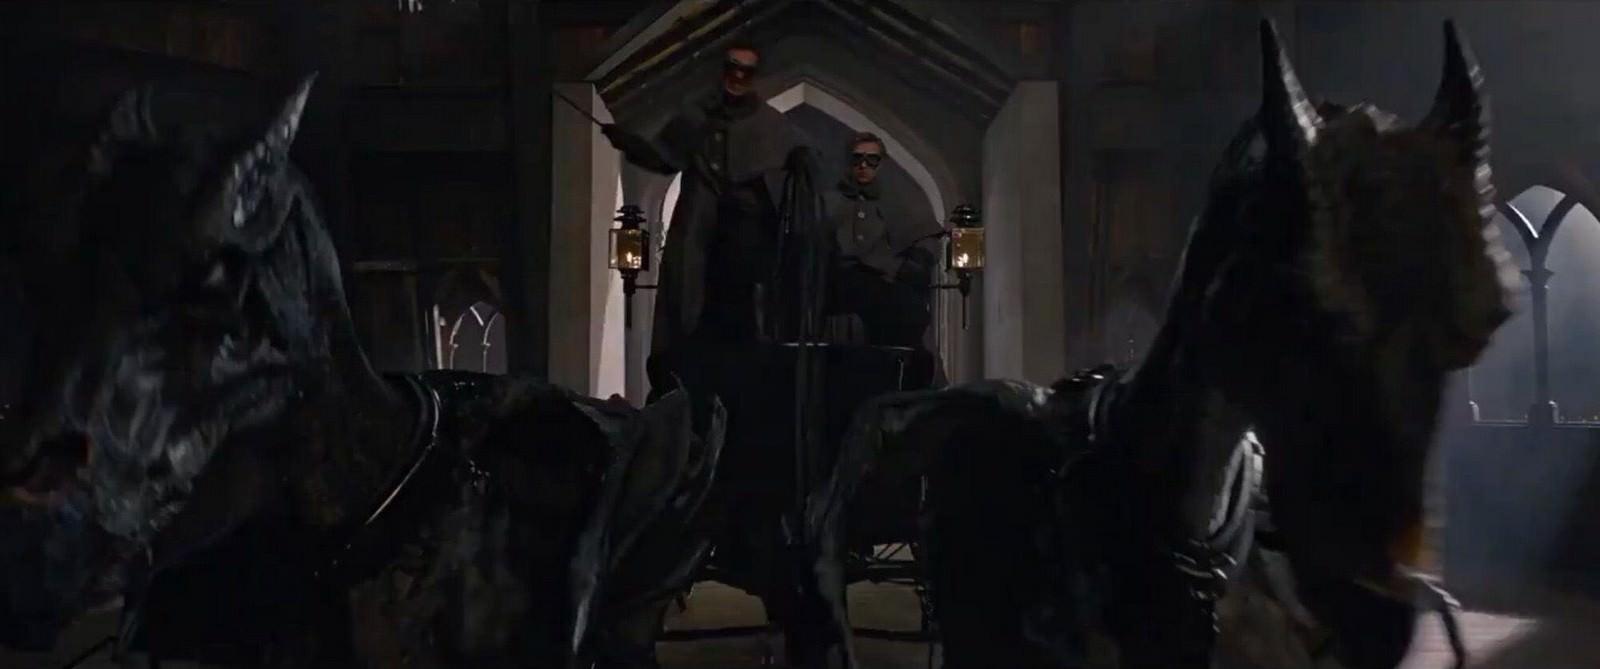 Movie, Fantastic Beasts: The Crimes of Grindelwald(美國, 2018年) / 怪獸與葛林戴華德的罪行(台灣) / 神奇动物:格林德沃之罪(中國) / 怪獸與葛林戴華德之罪(香港), 神奇怪獸介紹